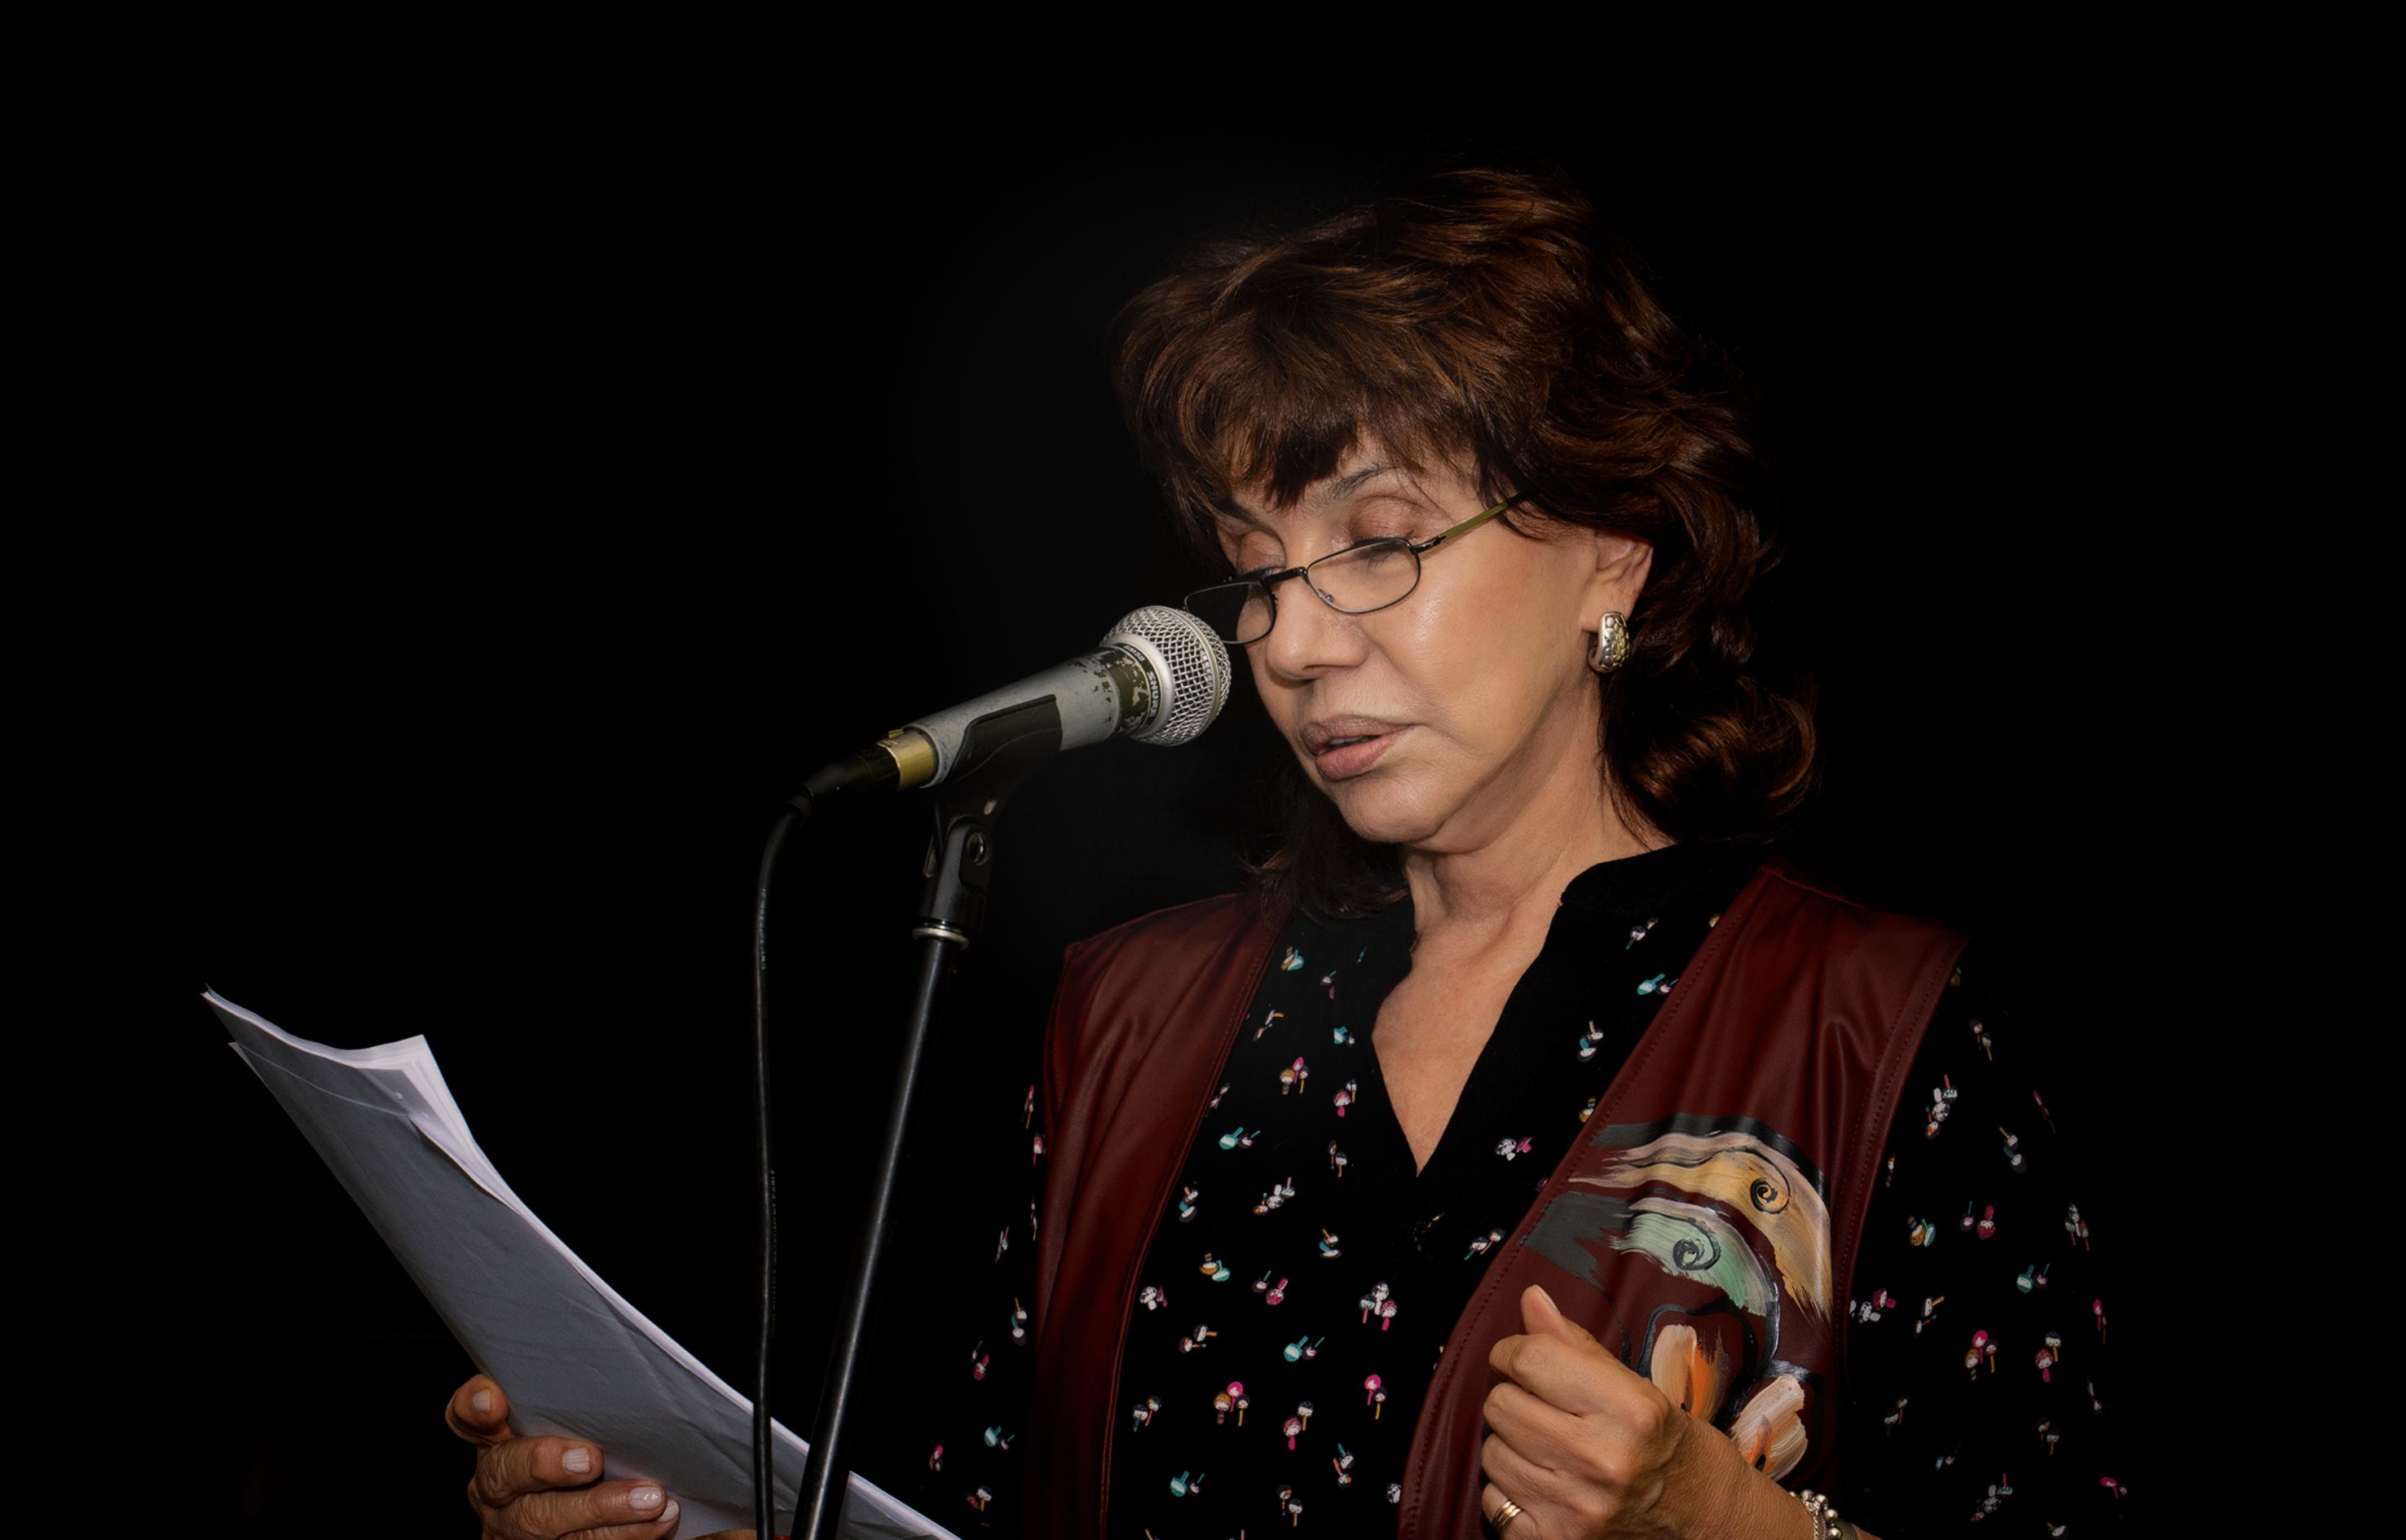 Nora Cárpena